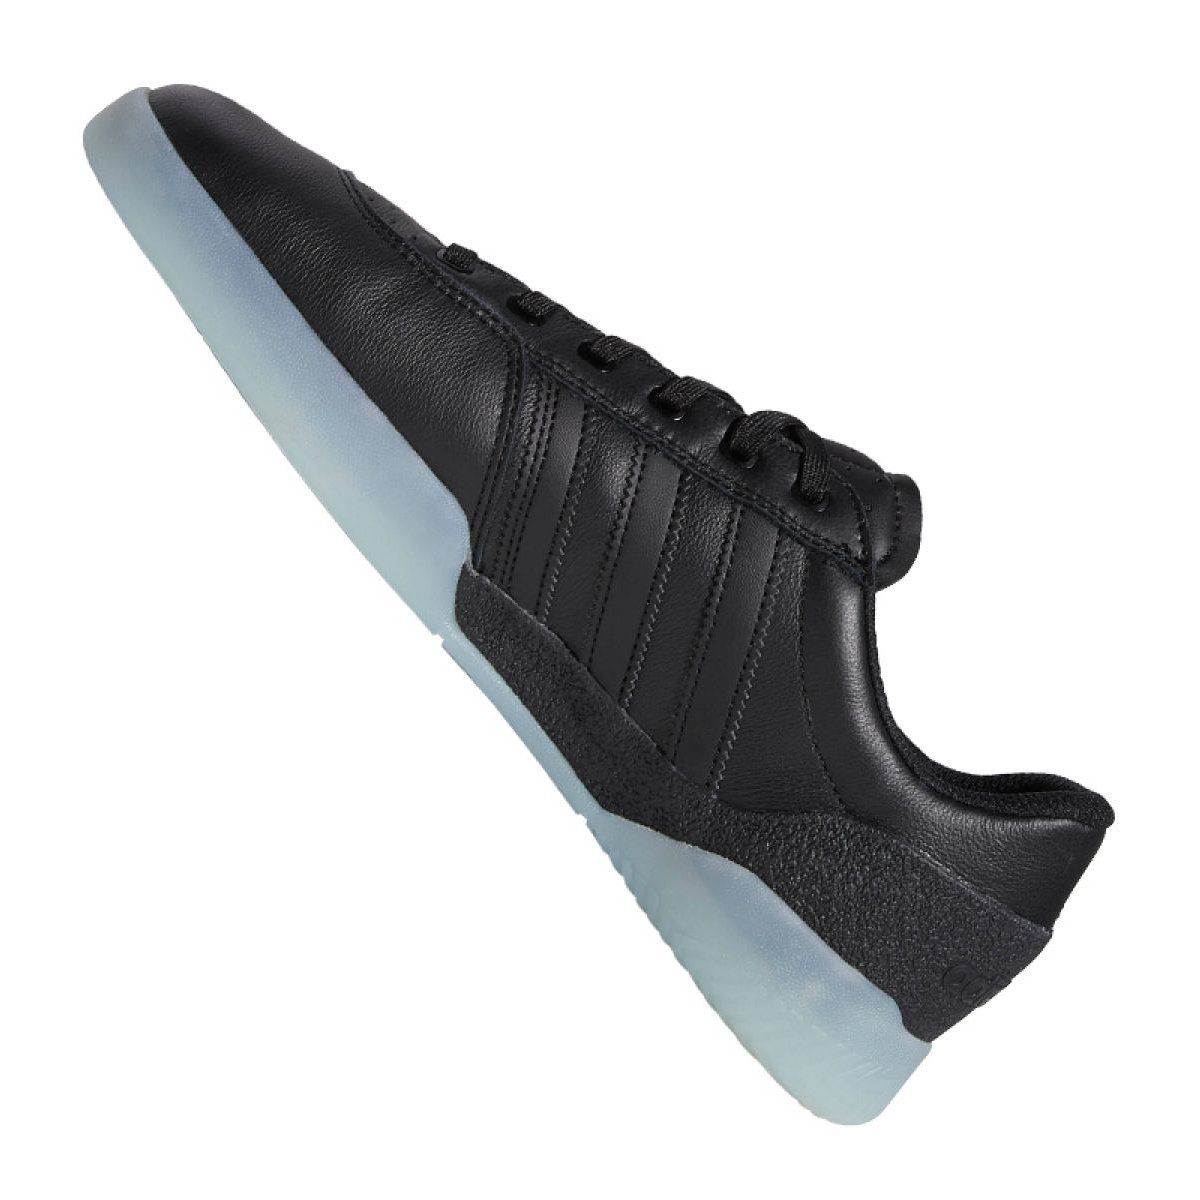 Buty Adidas City Cup Db3076 Czarne Black Shoes Adidas Sports Shoes Adidas